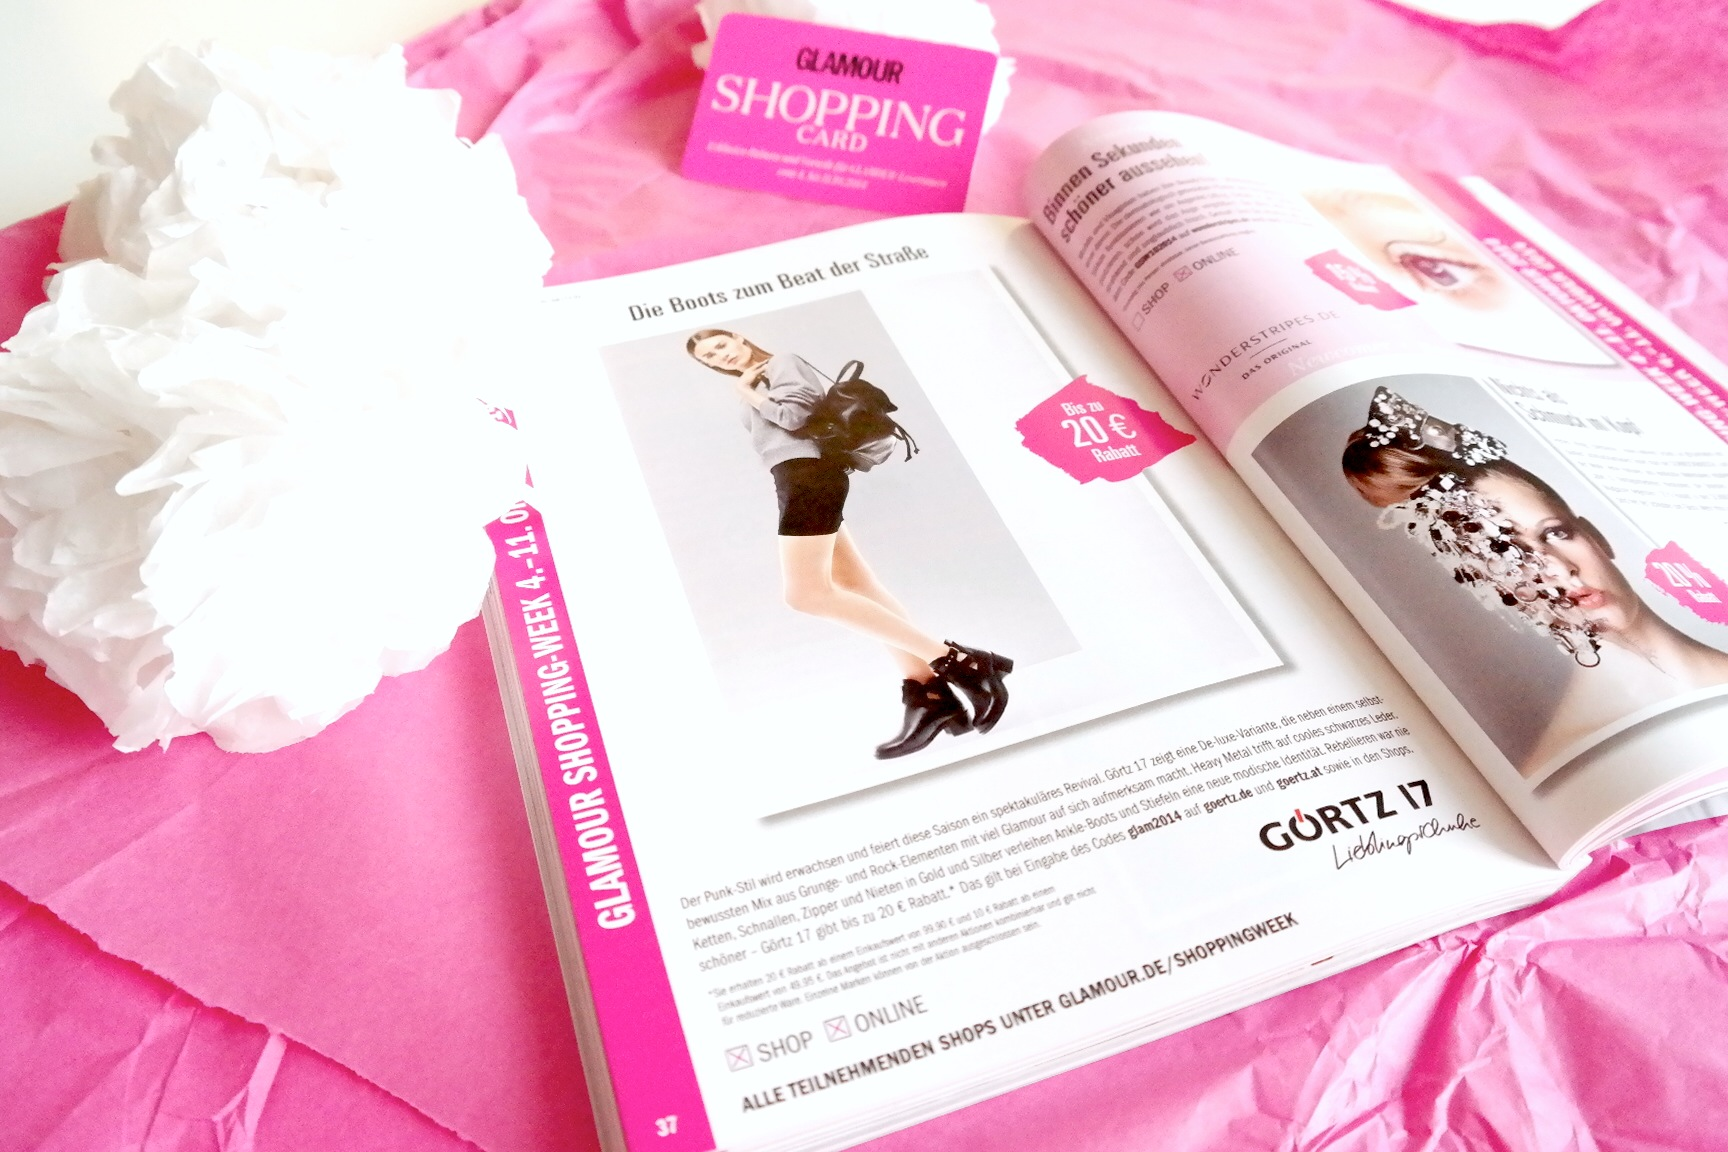 Zeitschrift Glamour Shopping Card